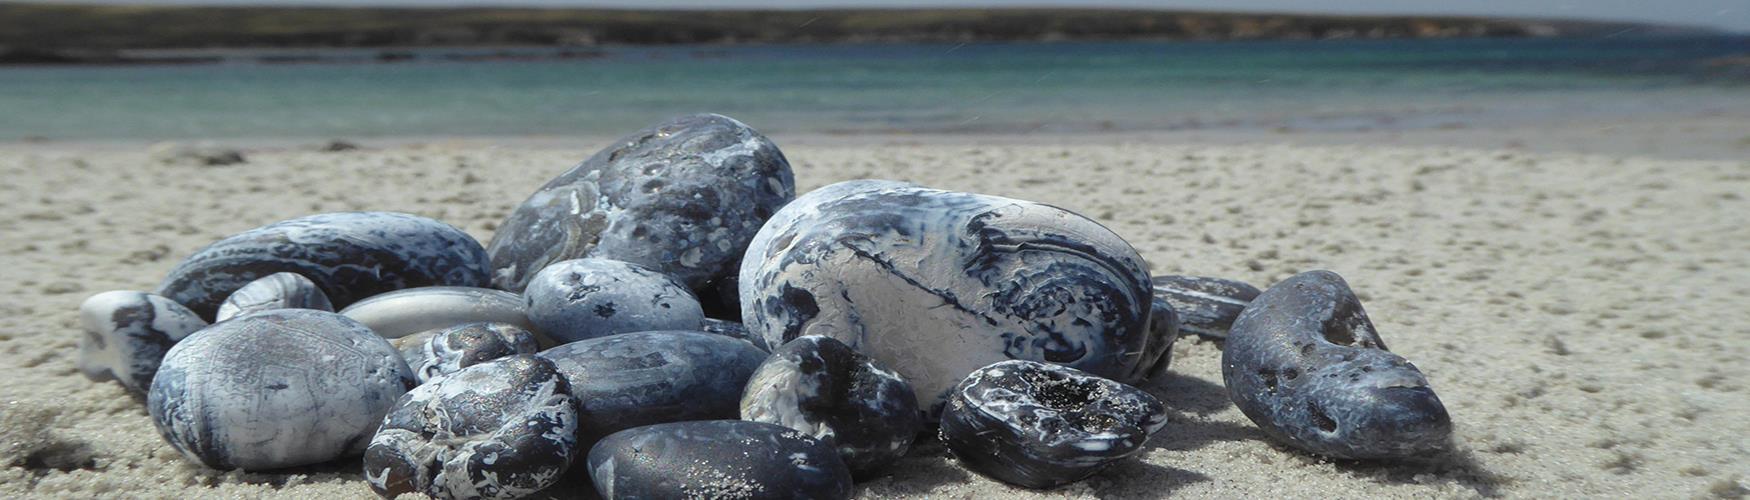 Falkland pebbles on a beach, Falkland Islands